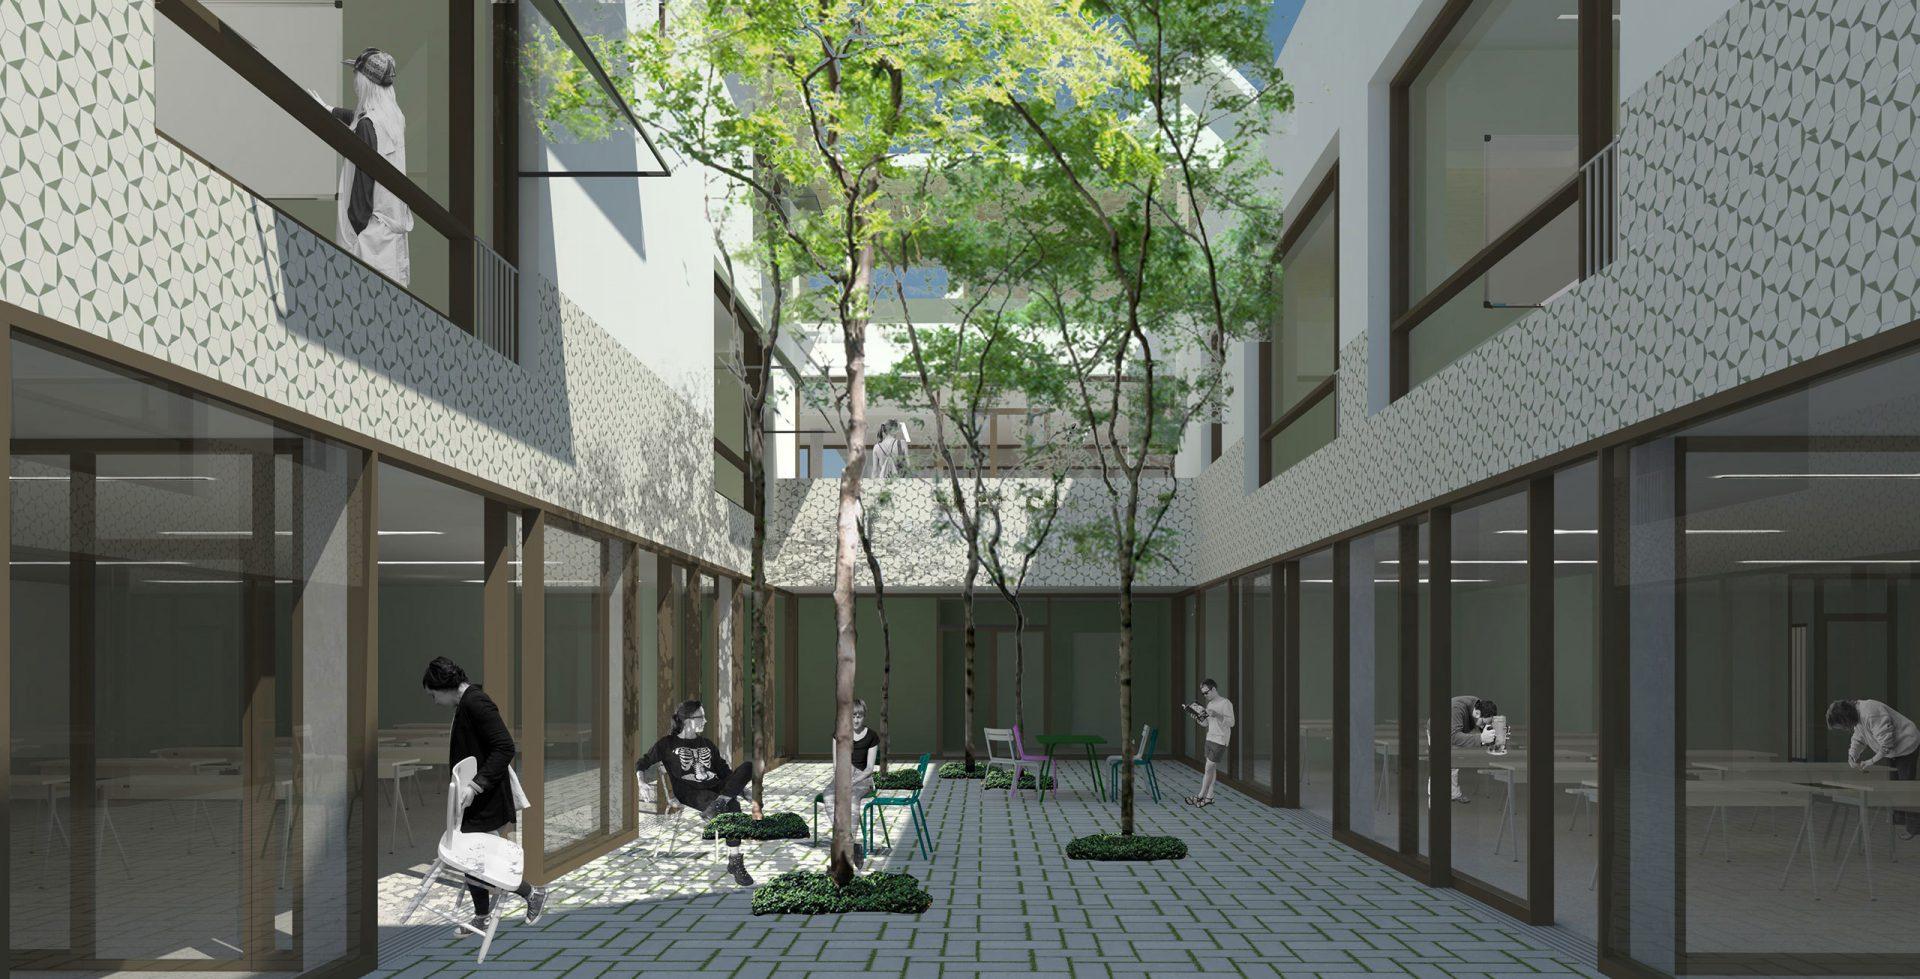 Lakbors Render Courtyard